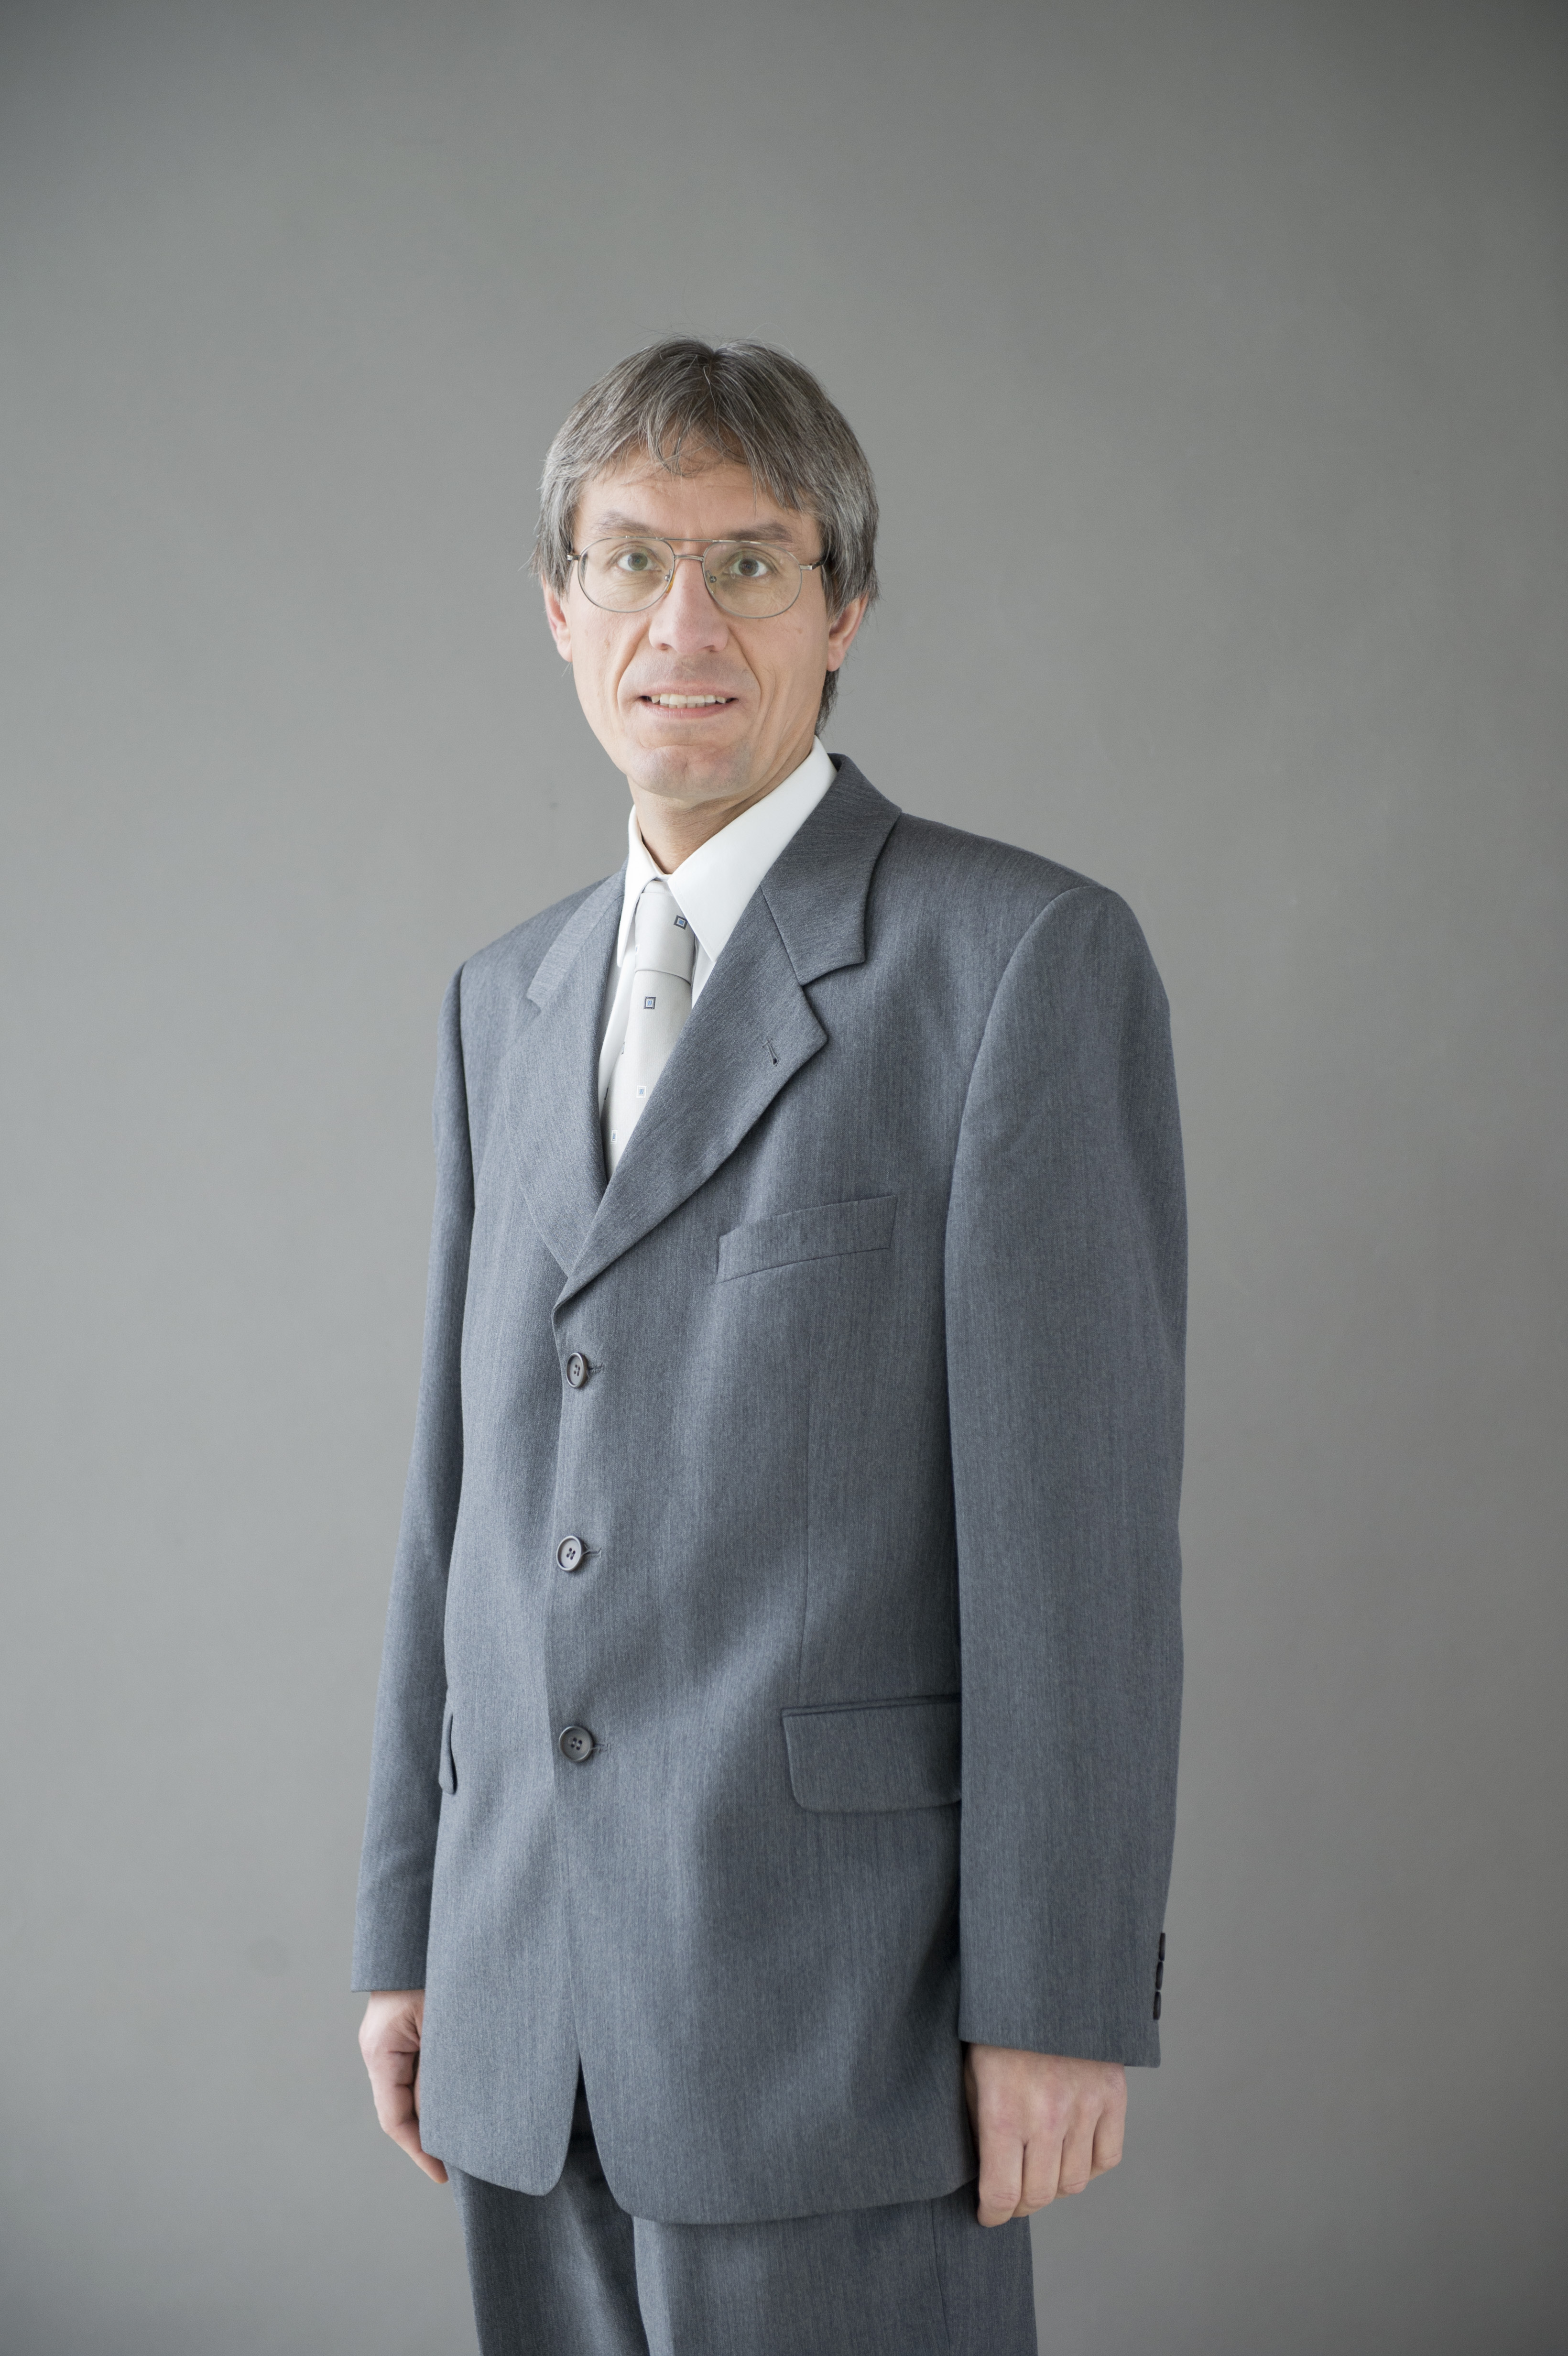 Albert Scheuerer